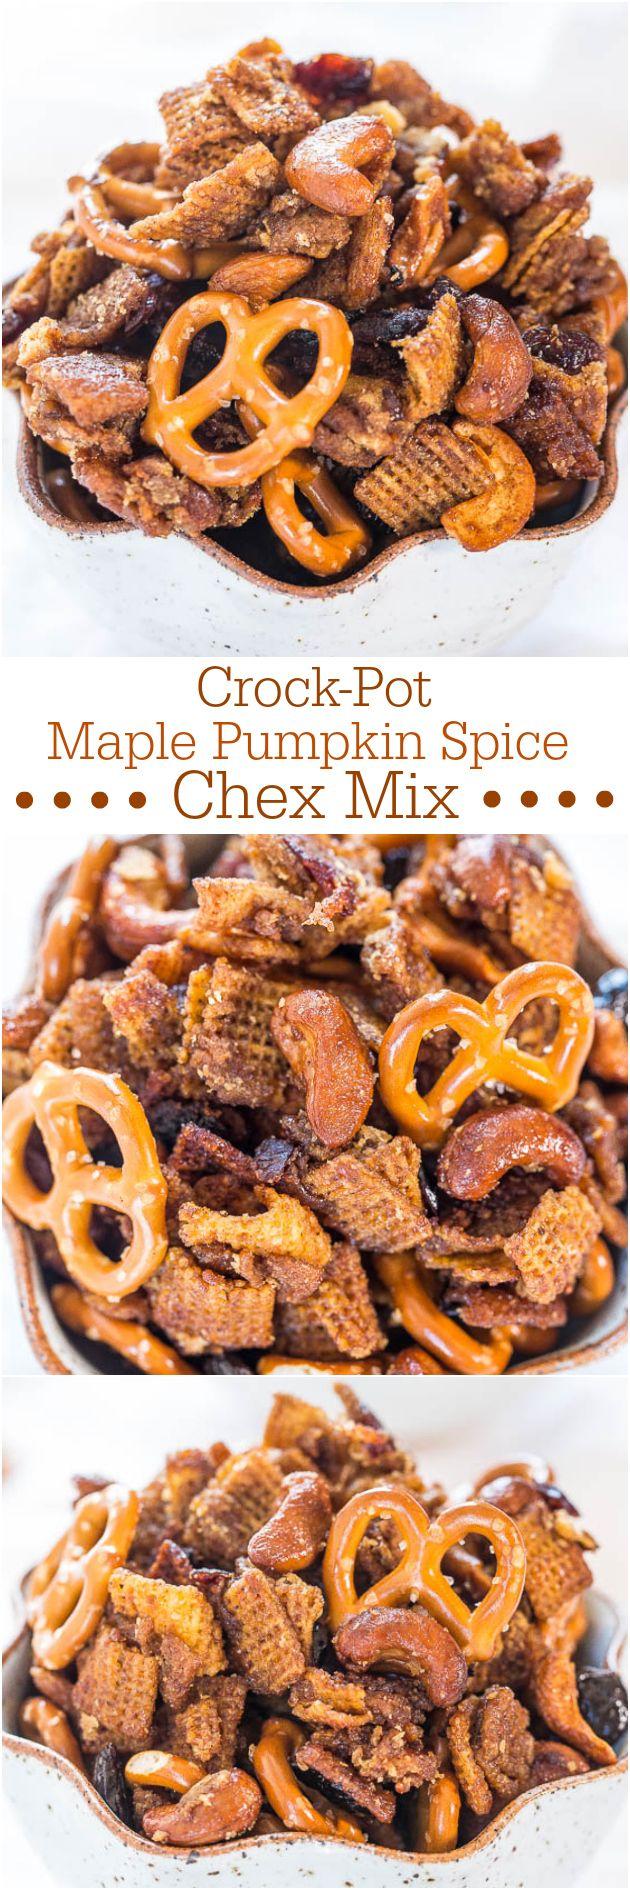 Crock-Pot Maple Pumpkin Spice Chex Mix.